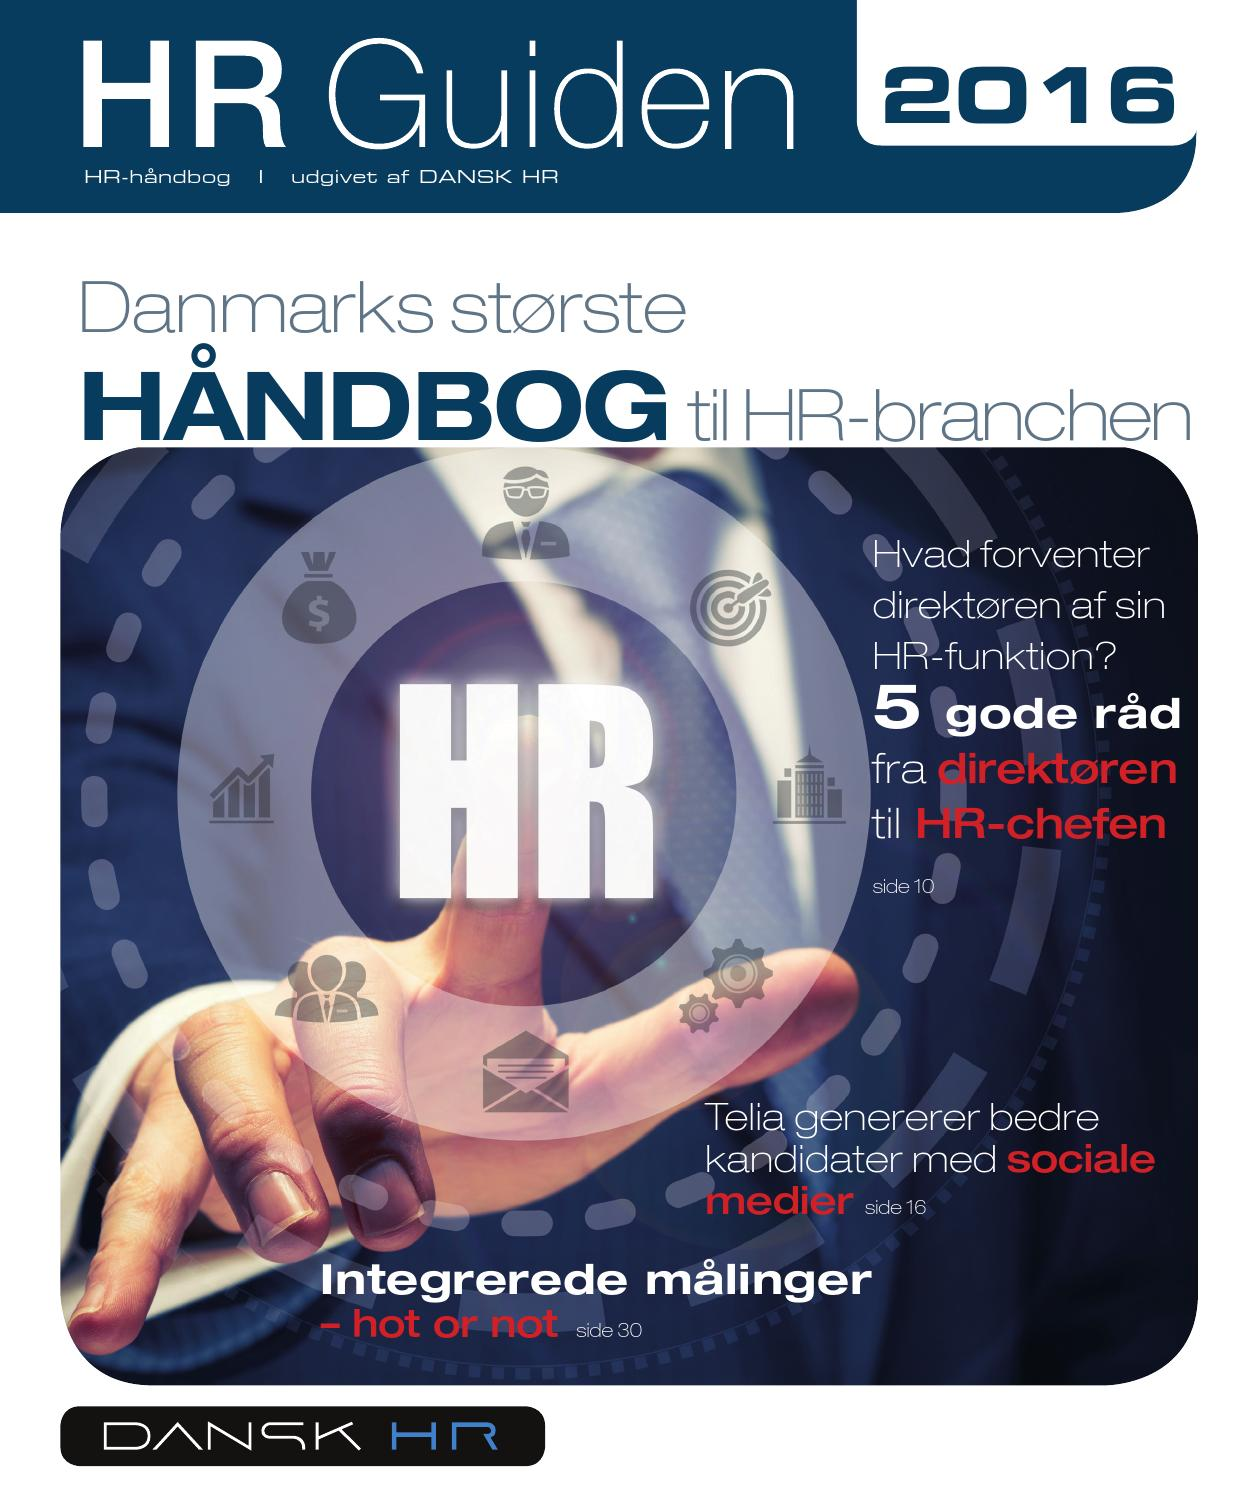 HR Guiden 2016 by DANSK HR - issuu